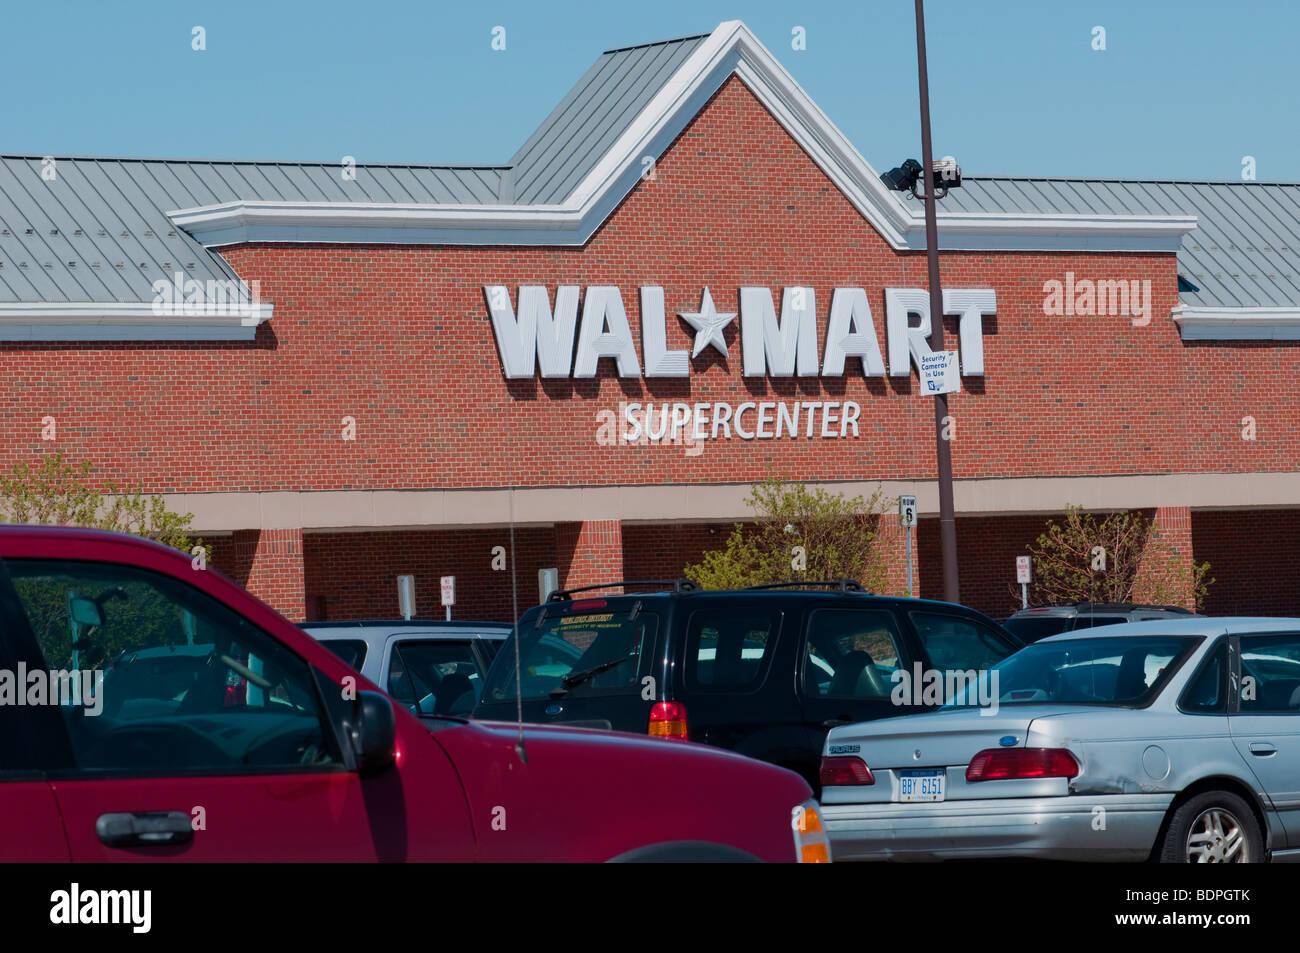 Wall-Mart Supercenter, Dearborn, Mi, US - Stock Image